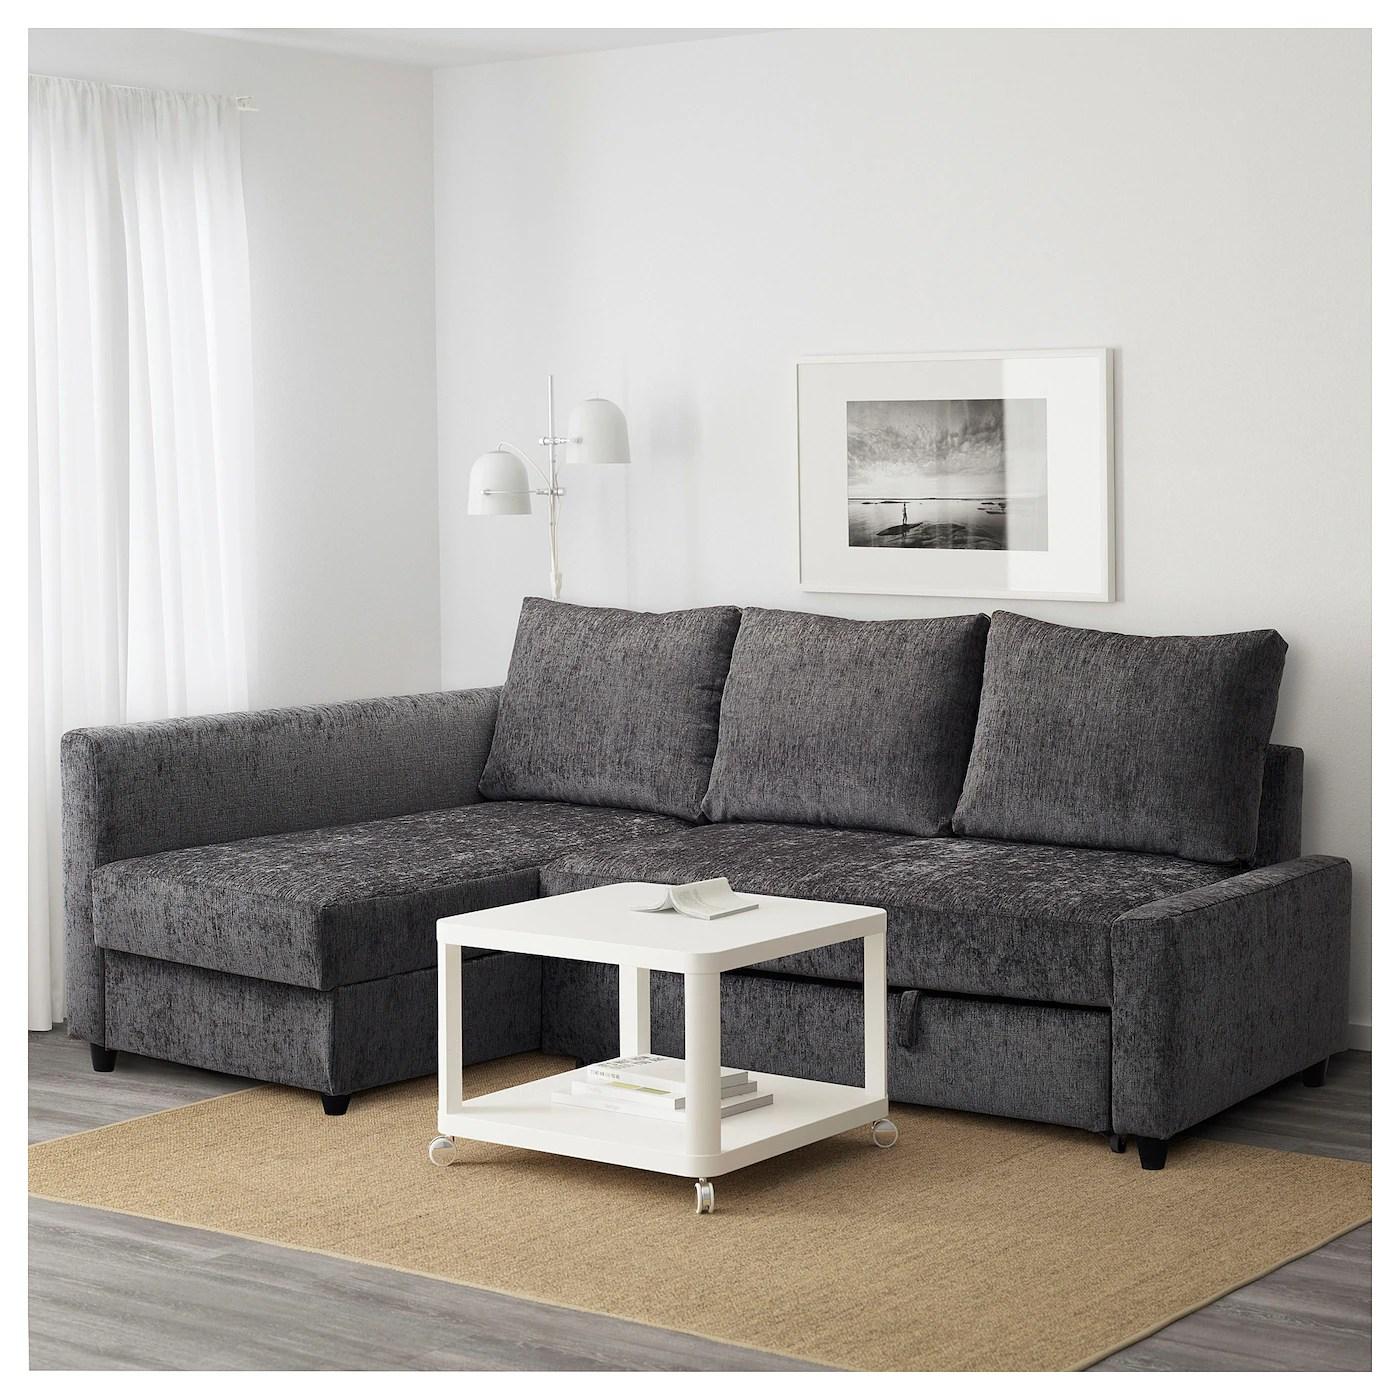 friheten corner sofa bed with storage skiftebo dark grey how to reupholster arms sofa-bed - ikea